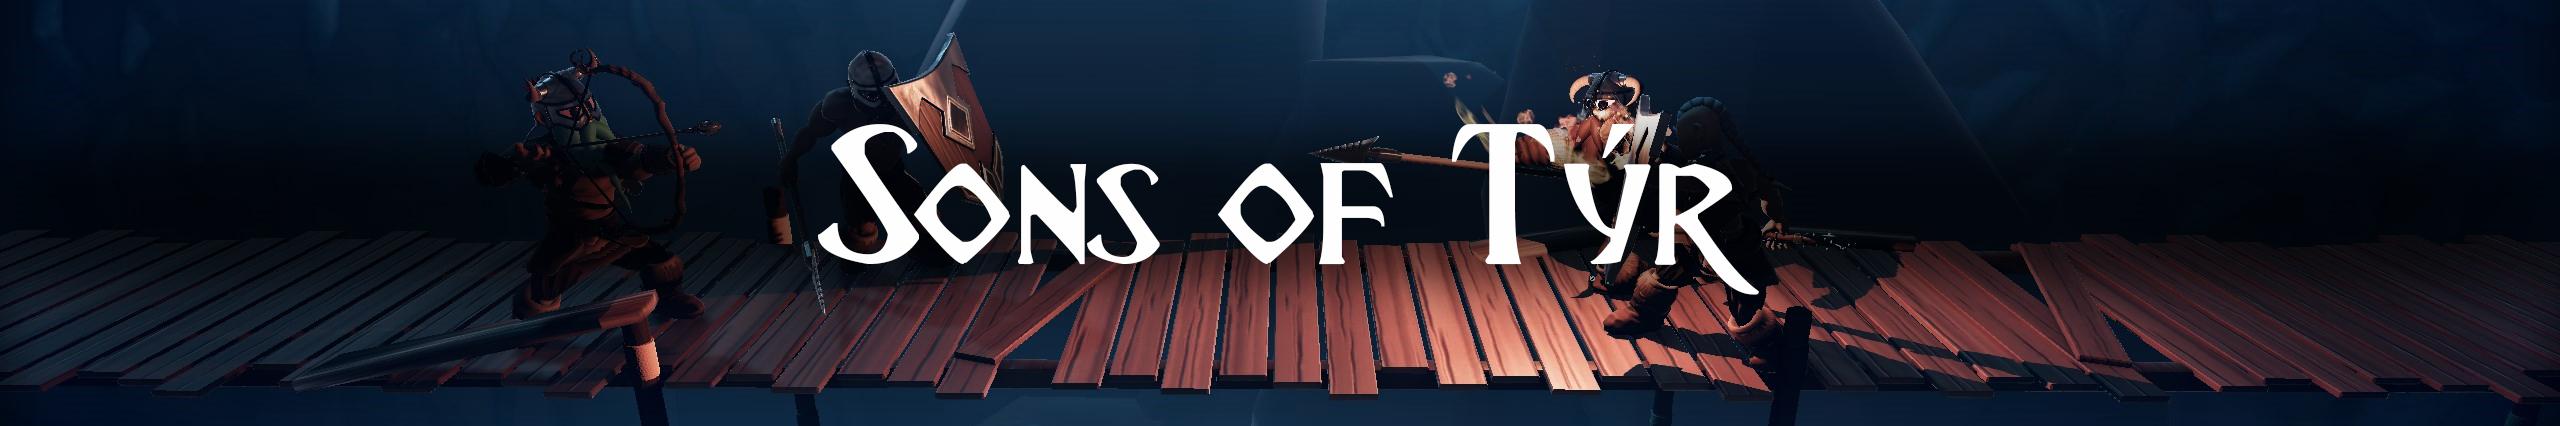 Sons of Týr